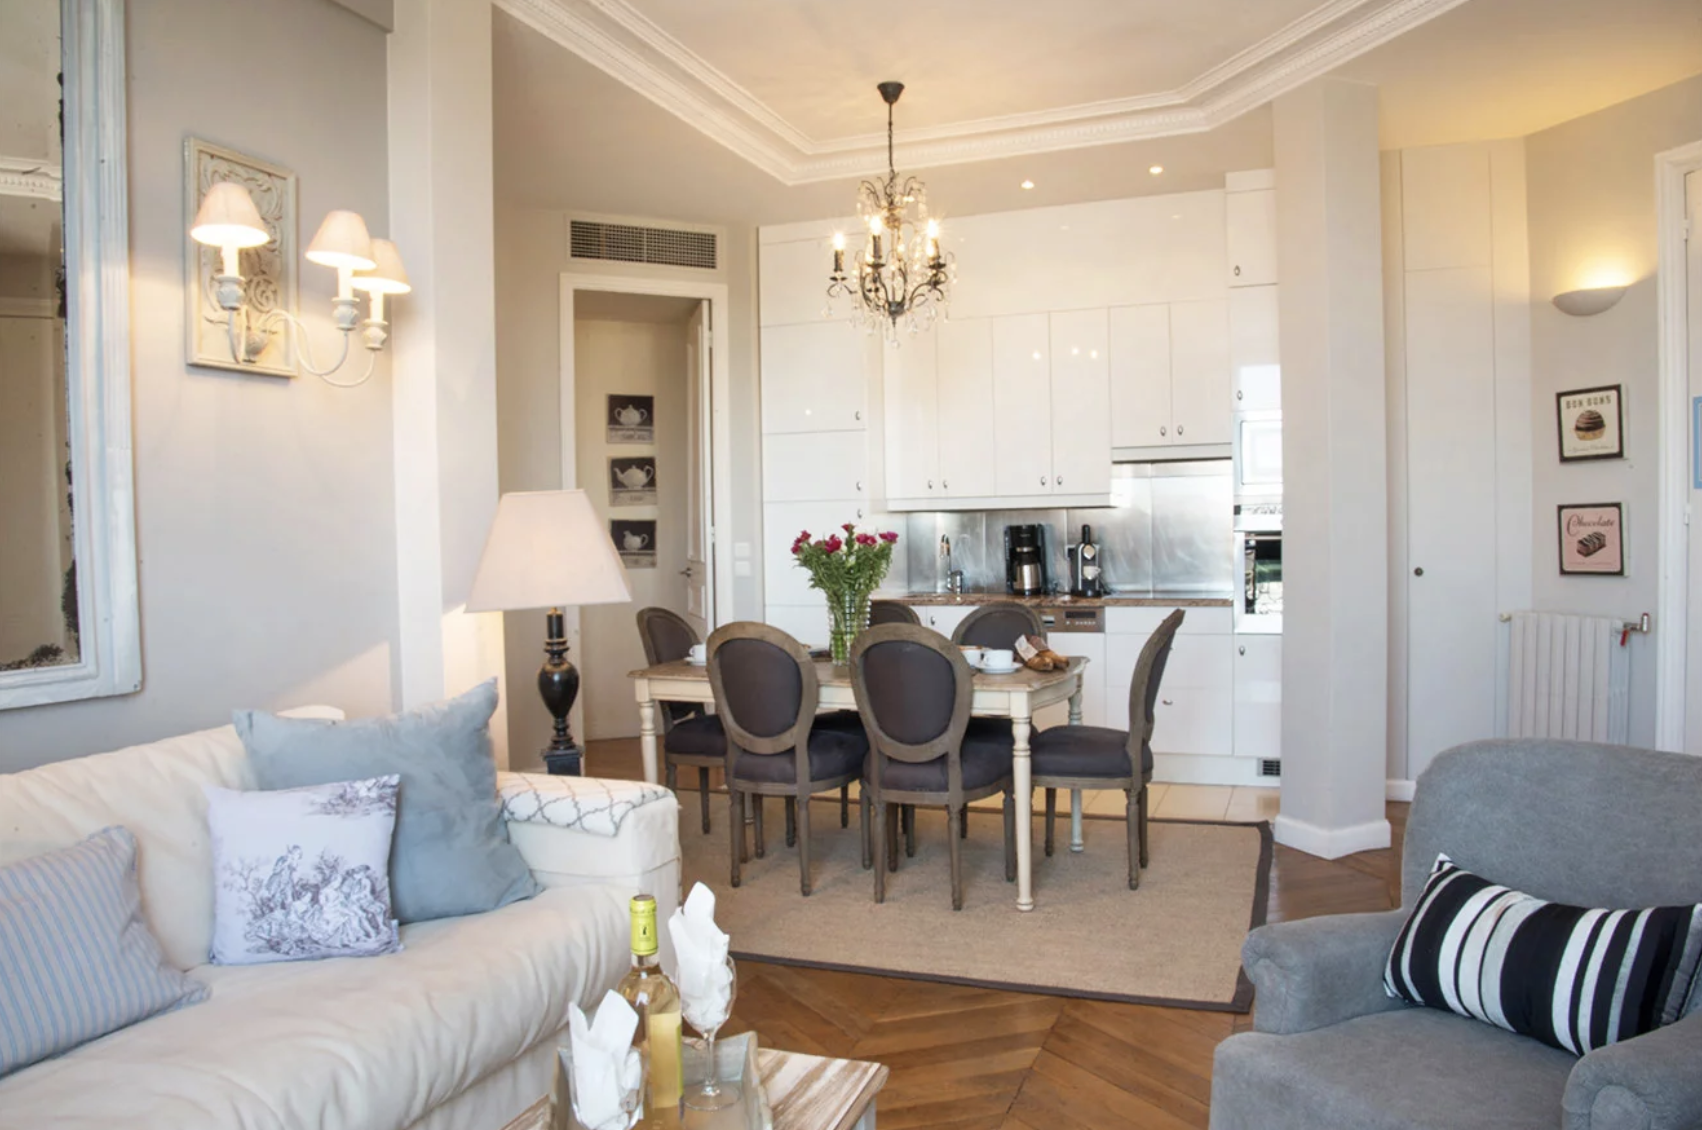 Paris 2019 With Images Parisian Interior Paris Accommodation House Makeovers